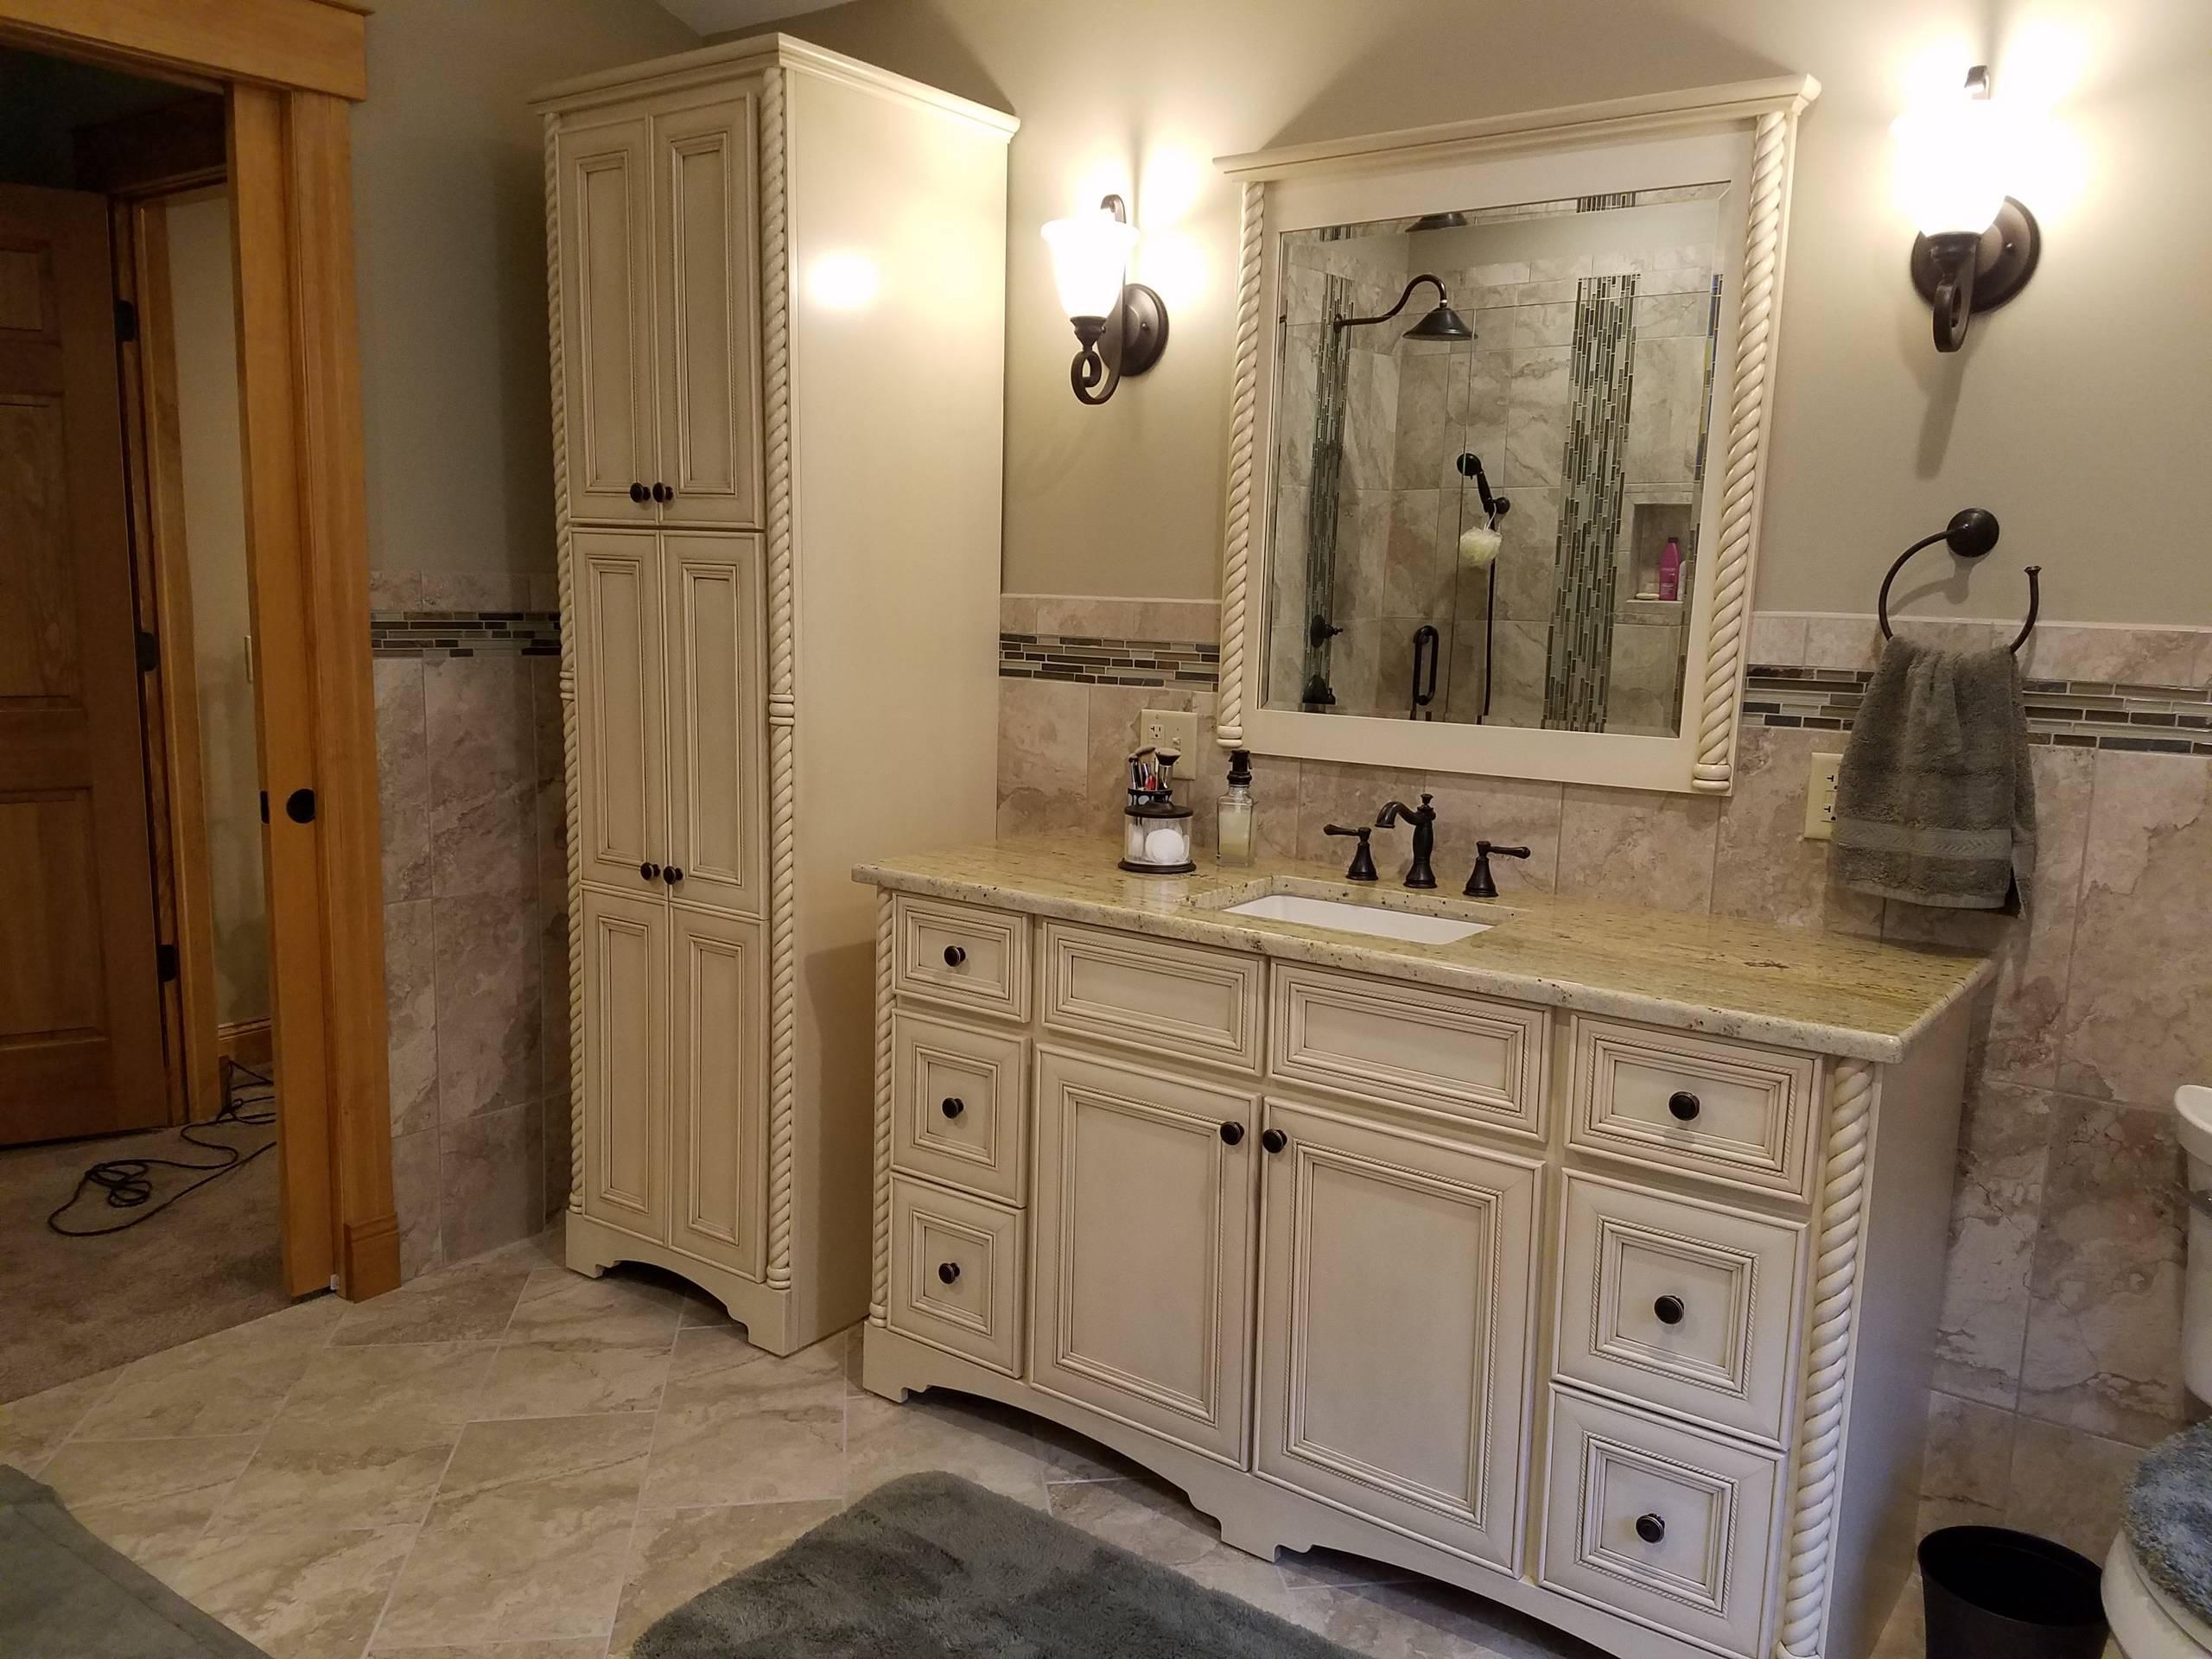 Bertch Vanity Linen Cabinet And Mirror, Bertch Bathroom Cabinets Reviews